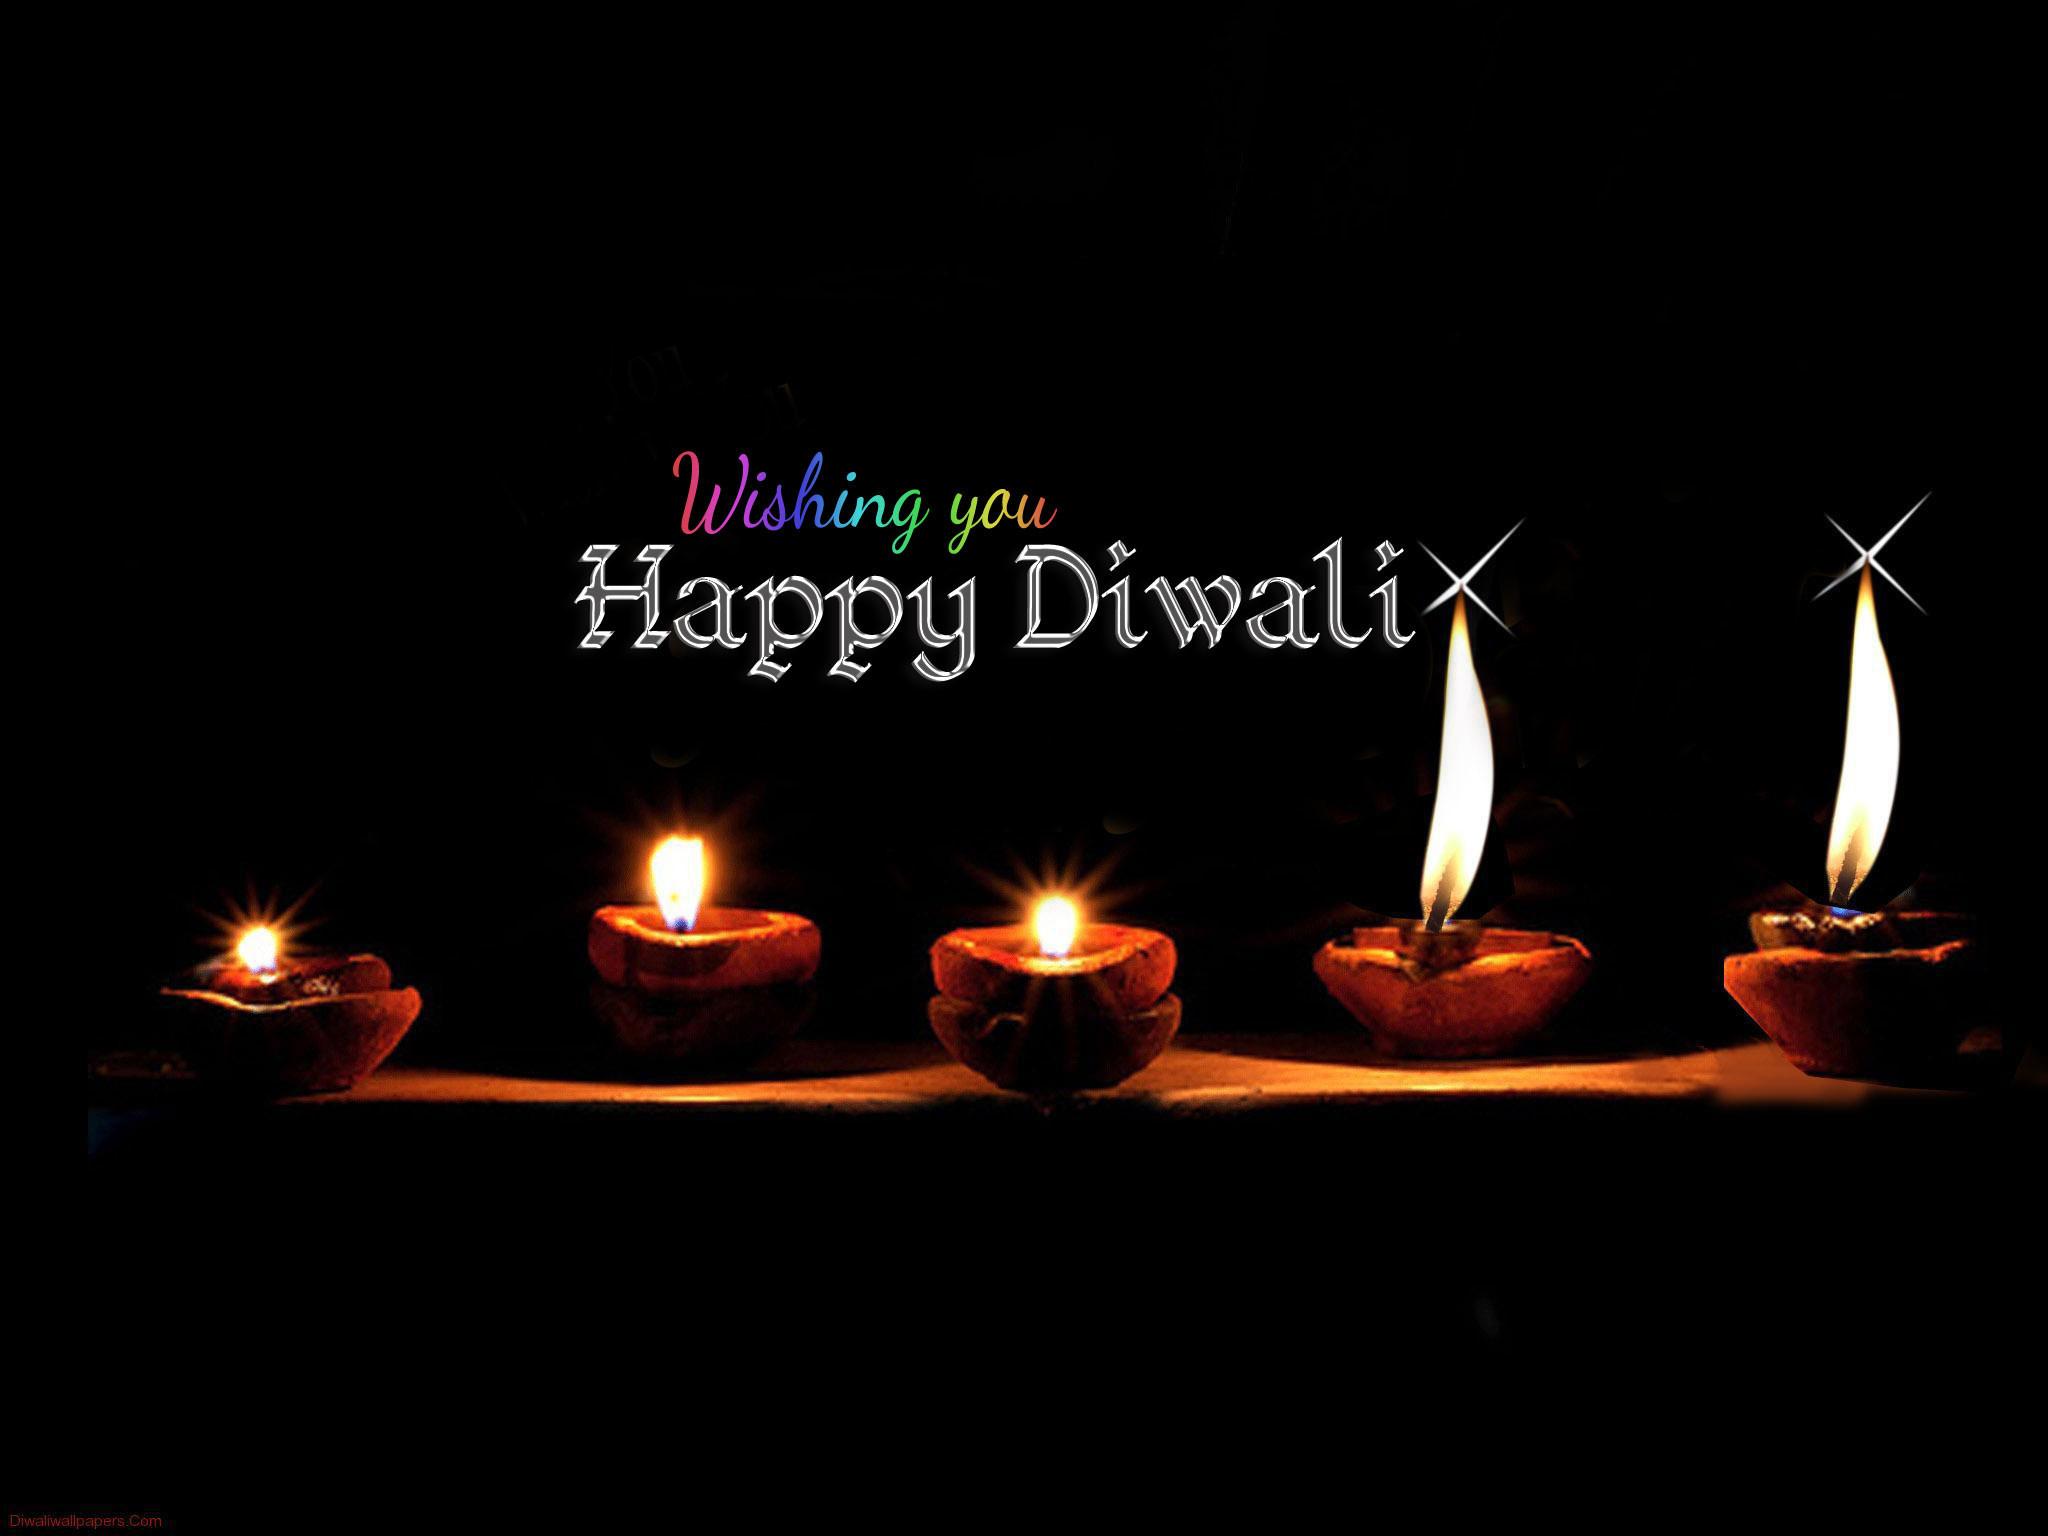 Elegant Quads Id With Diwali Sky Lamp Wallpaper   Data - Happy Diwali 2011 - HD Wallpaper